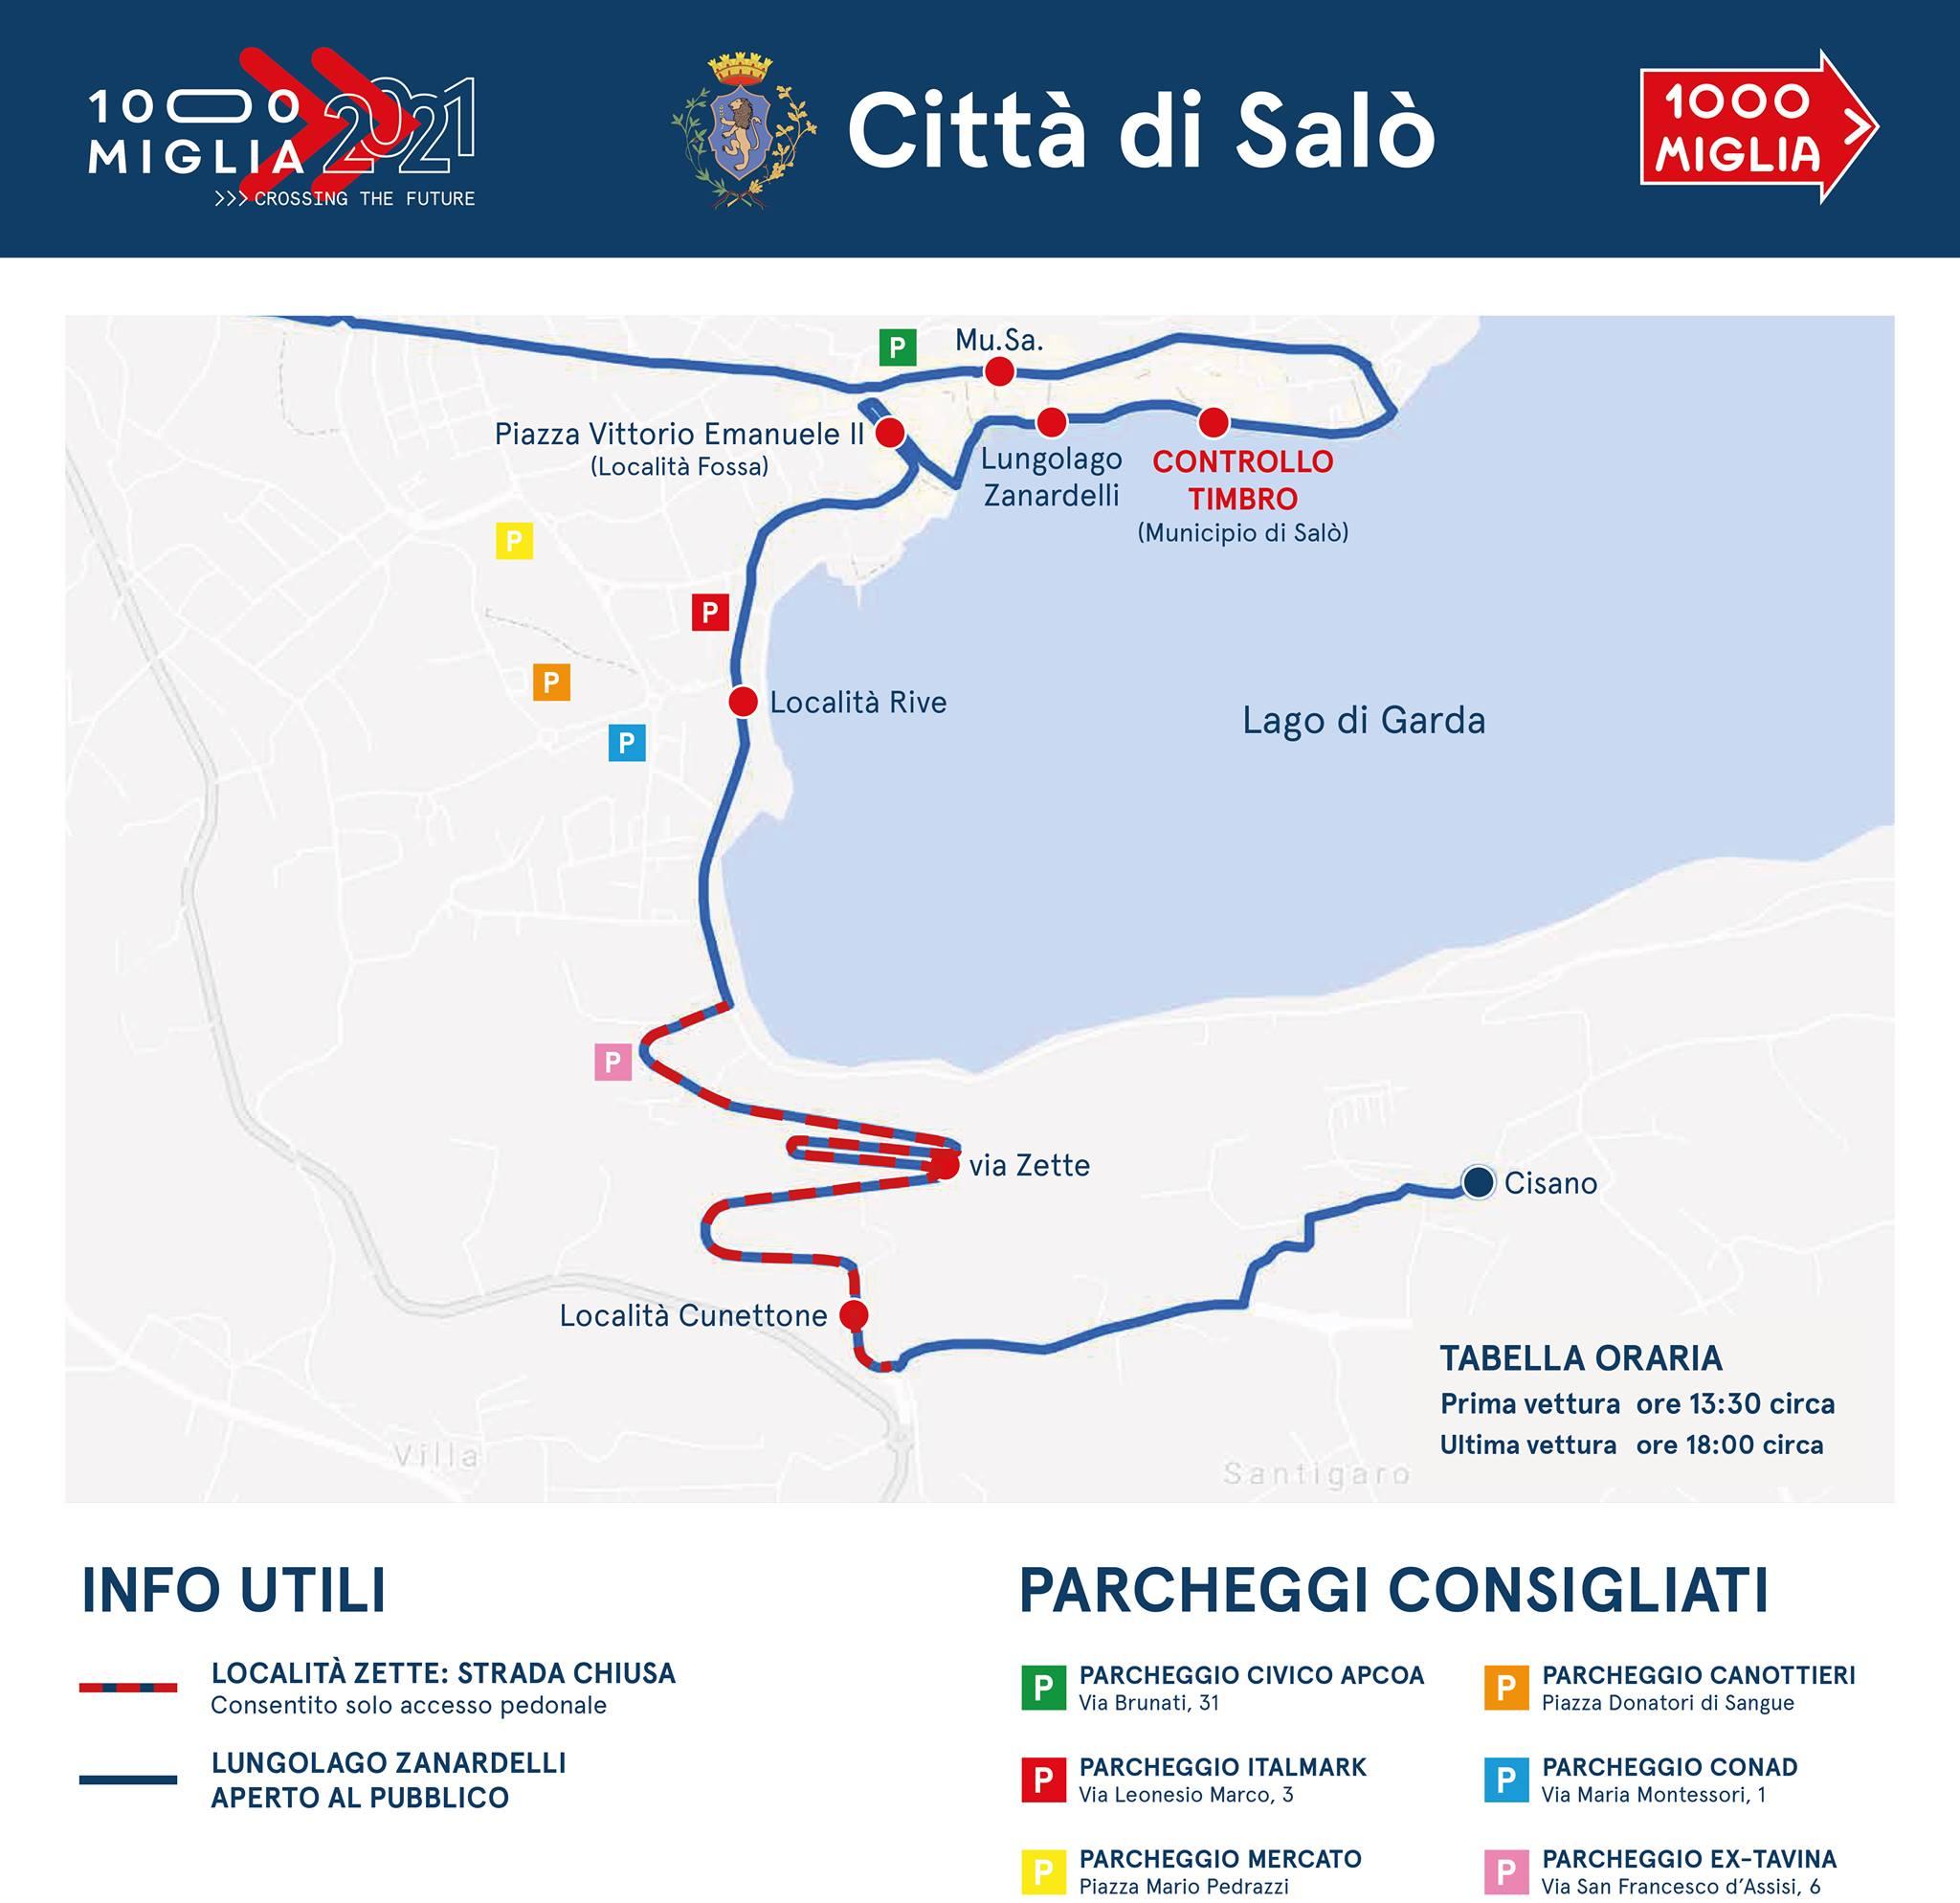 Millemiglia 2021 - 19 giugno arriva a Salò